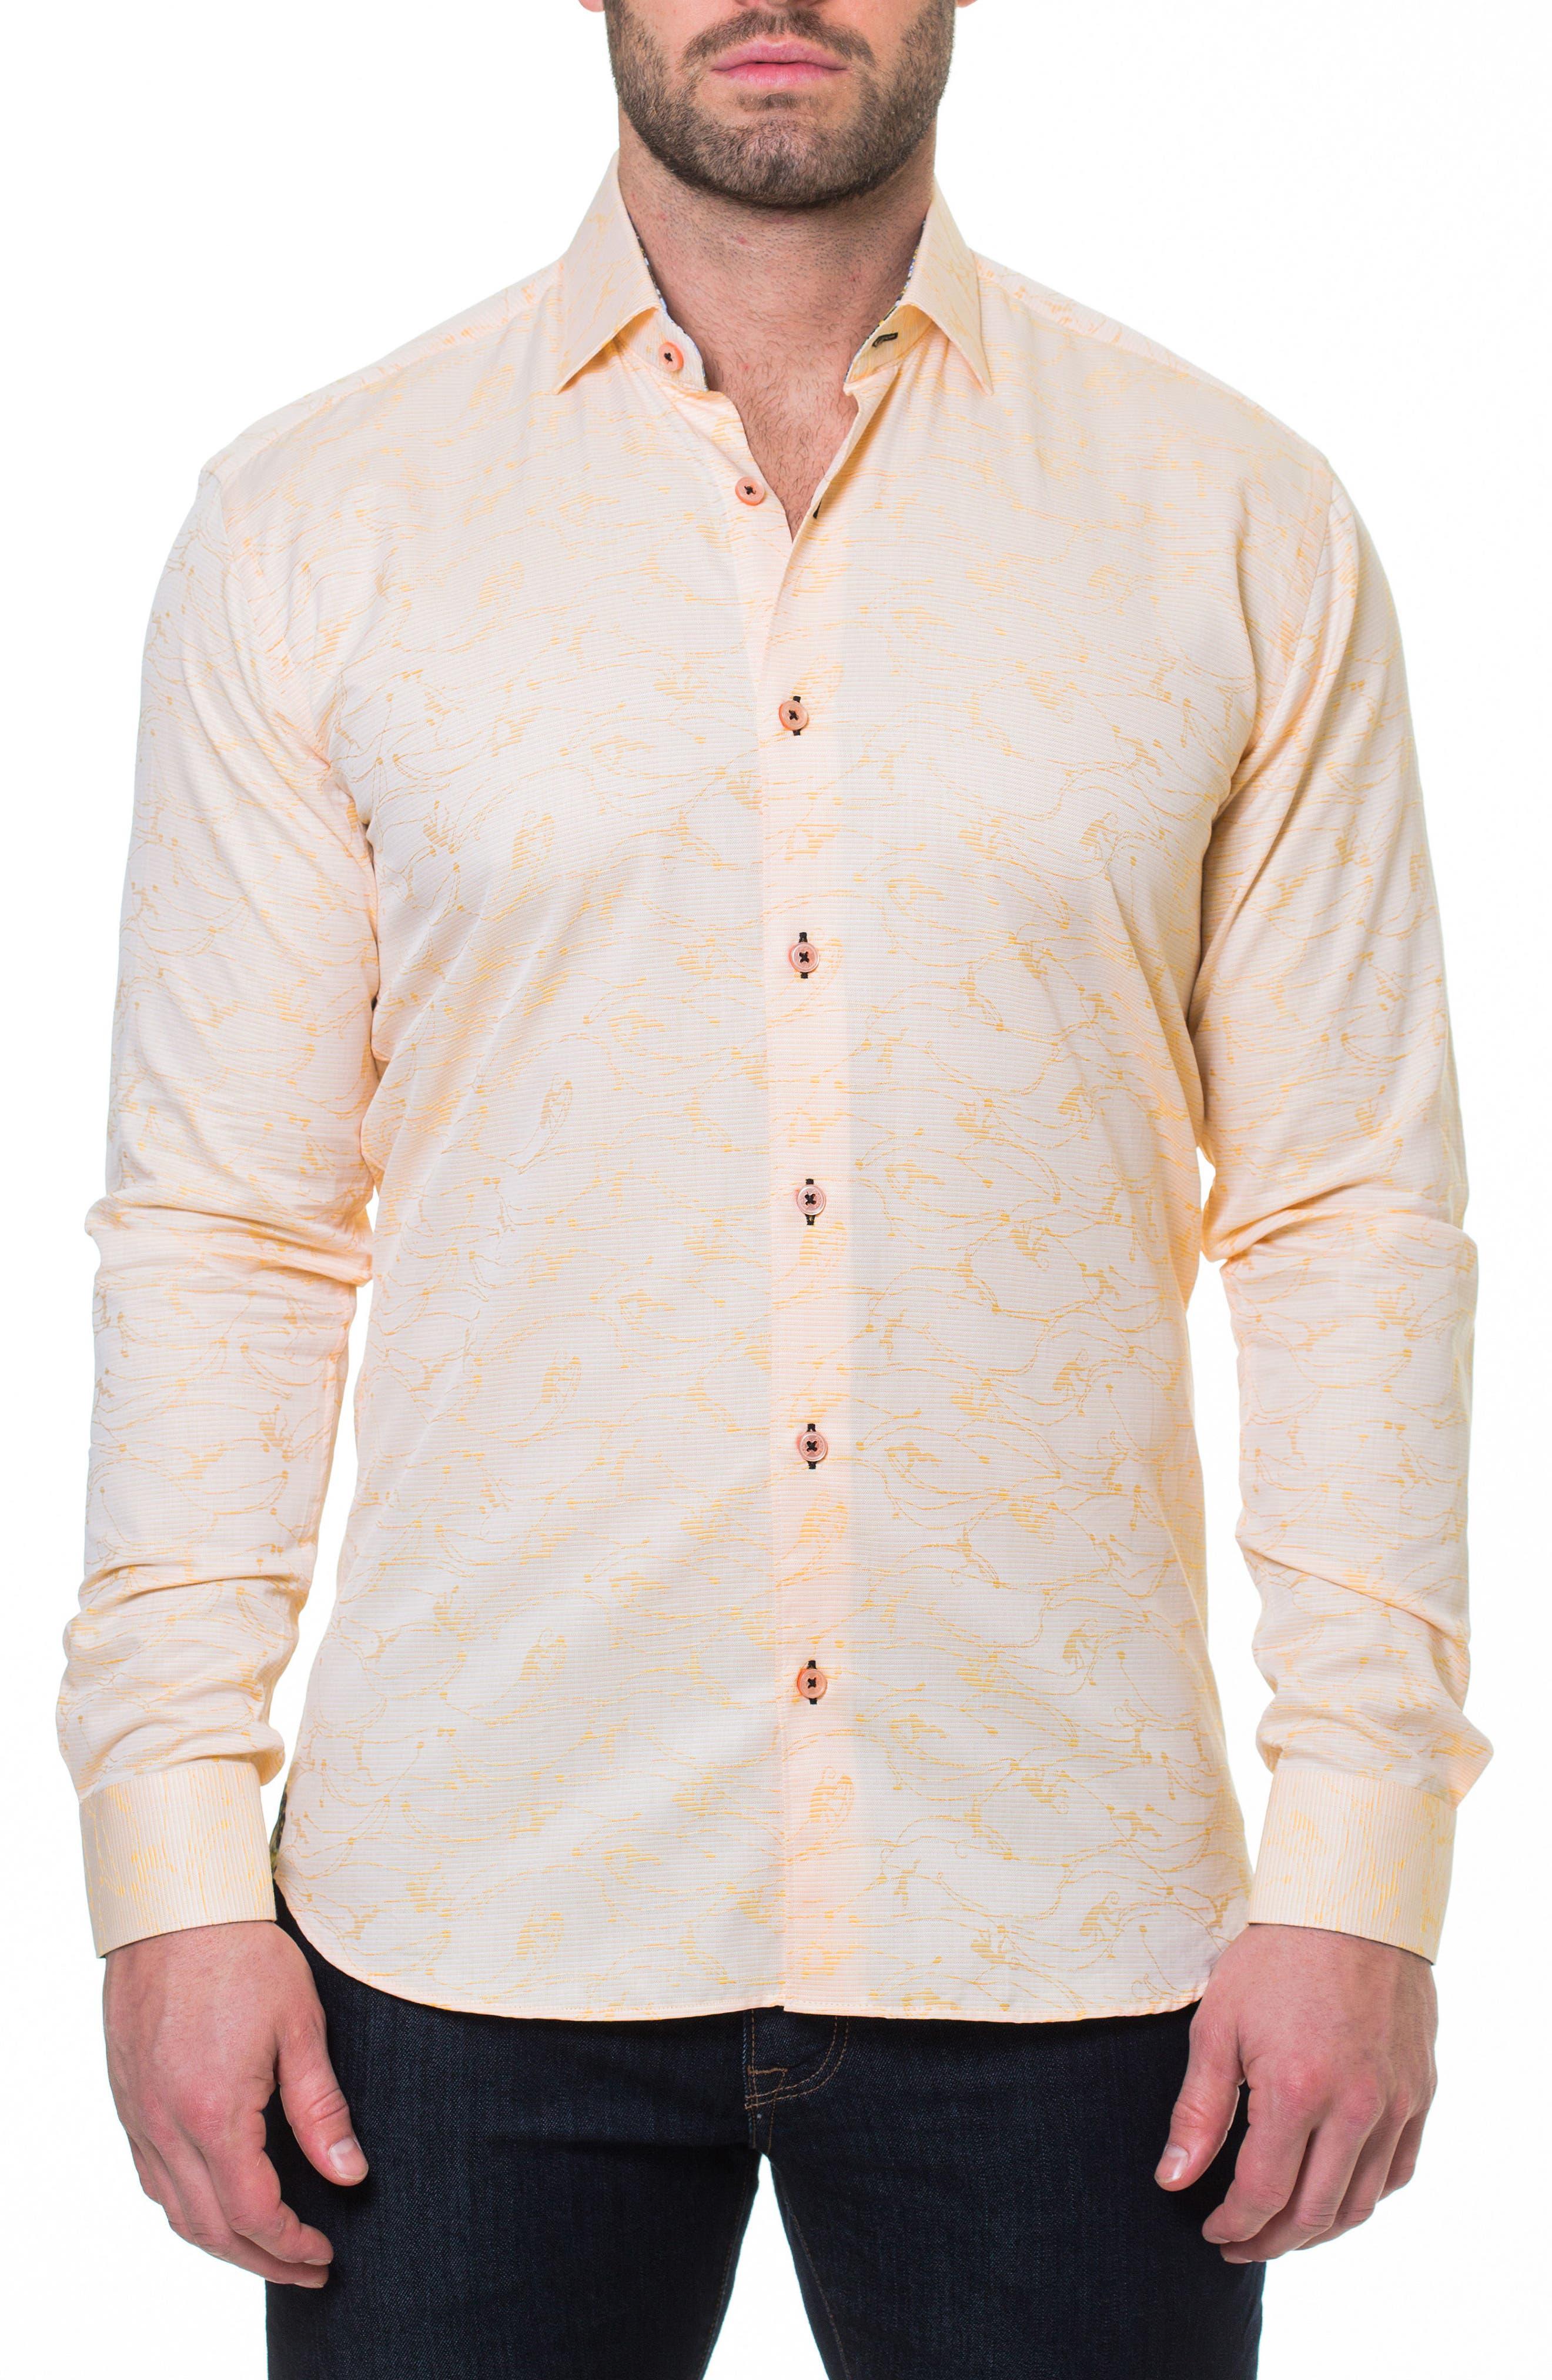 Luxor Monkey Slim Fit Sport Shirt,                             Alternate thumbnail 4, color,                             YELLOW